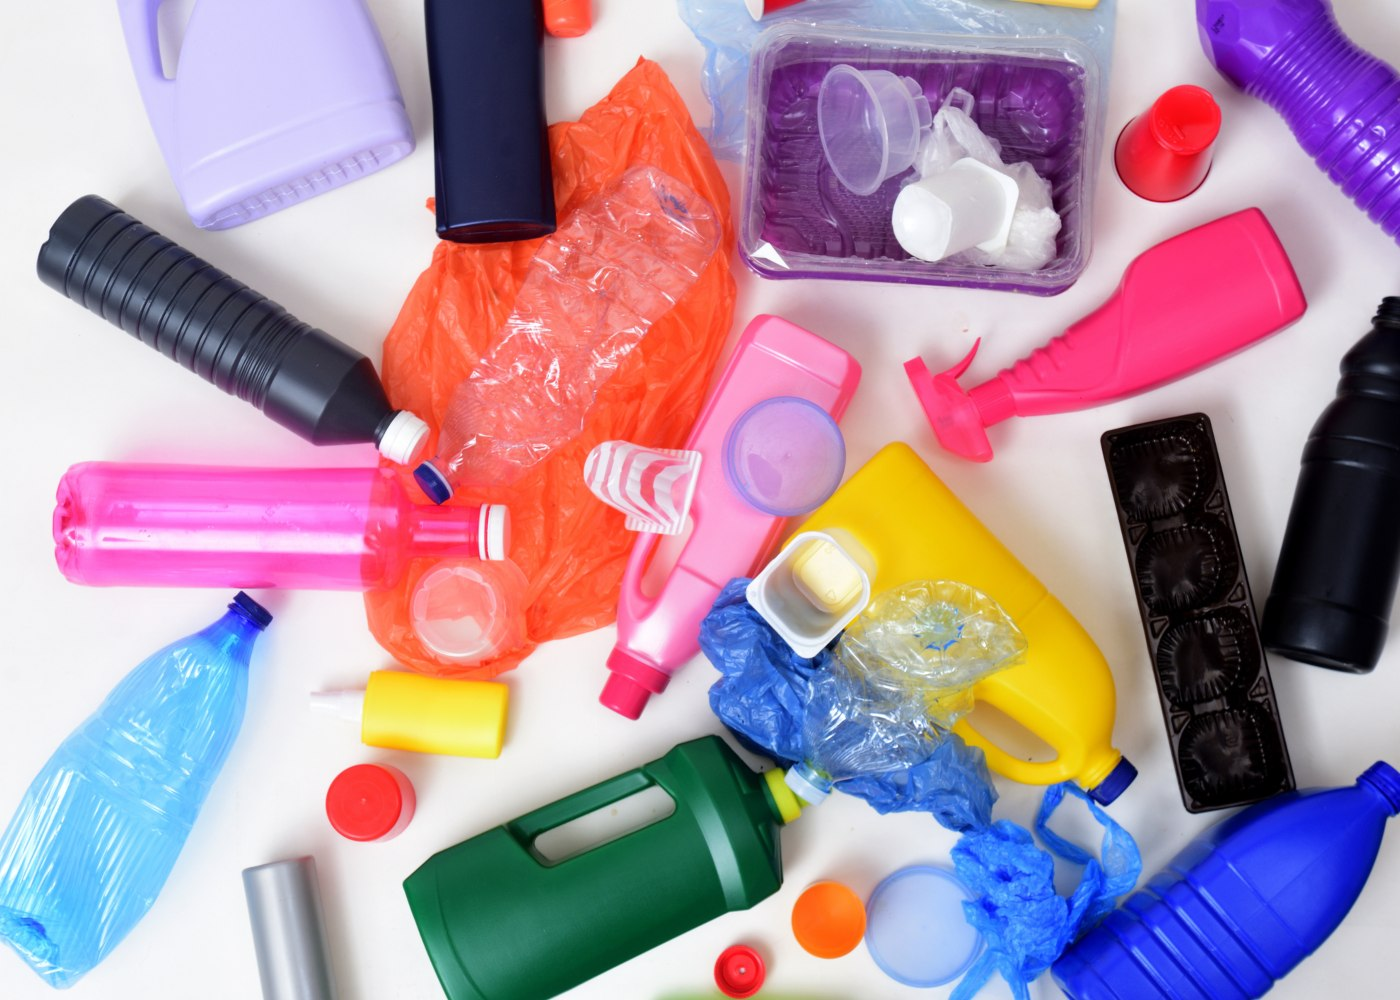 produtos de plástico que deve deixar de usar